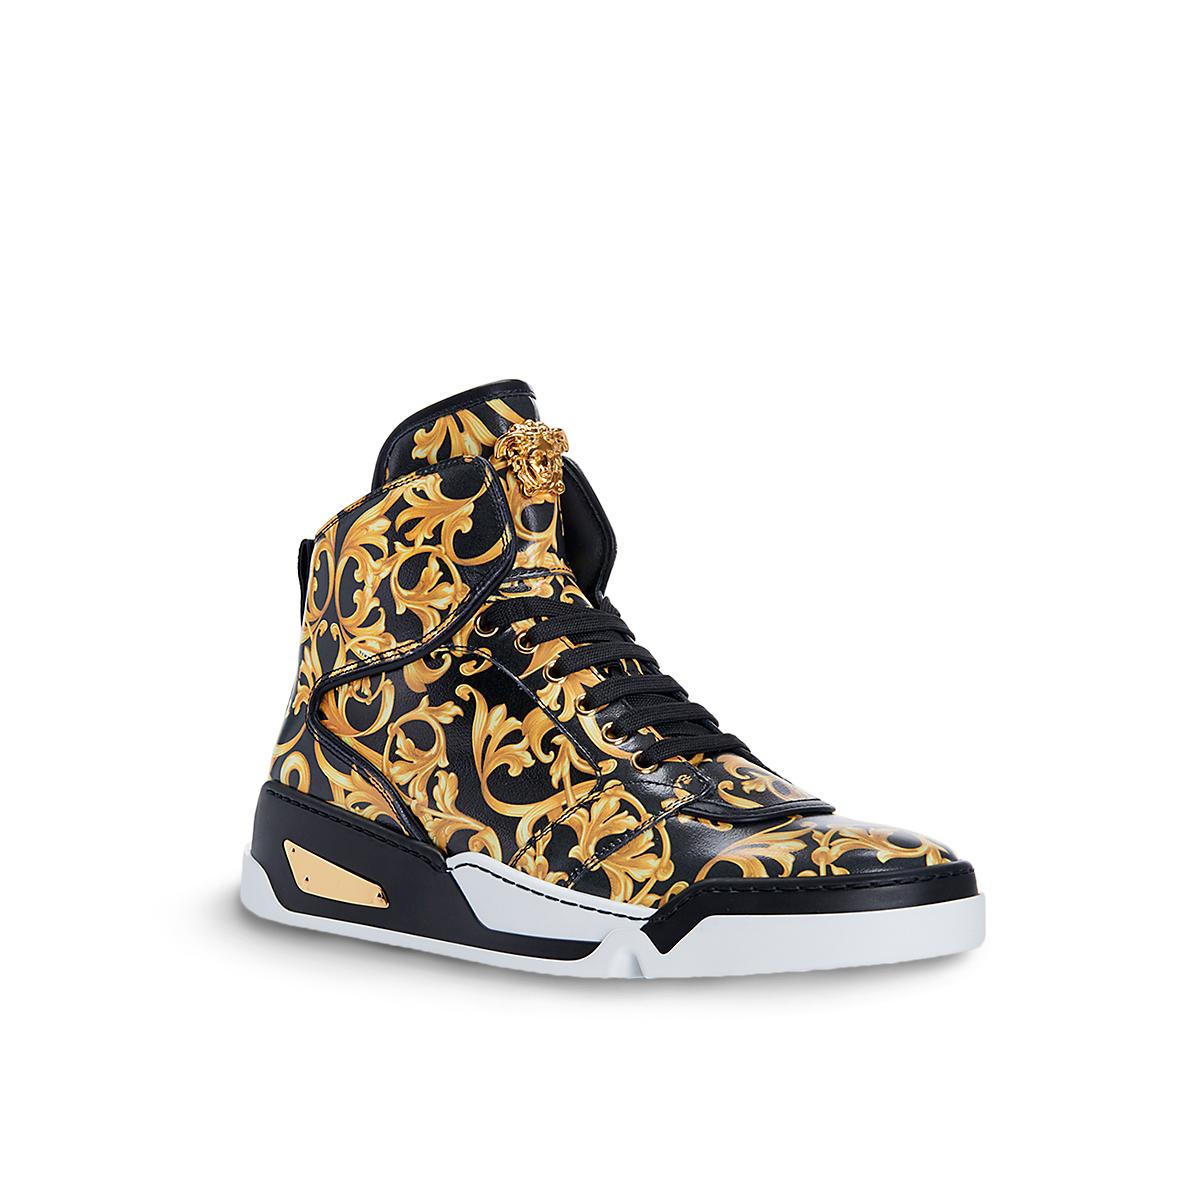 Versace Barocco sneakers in fine